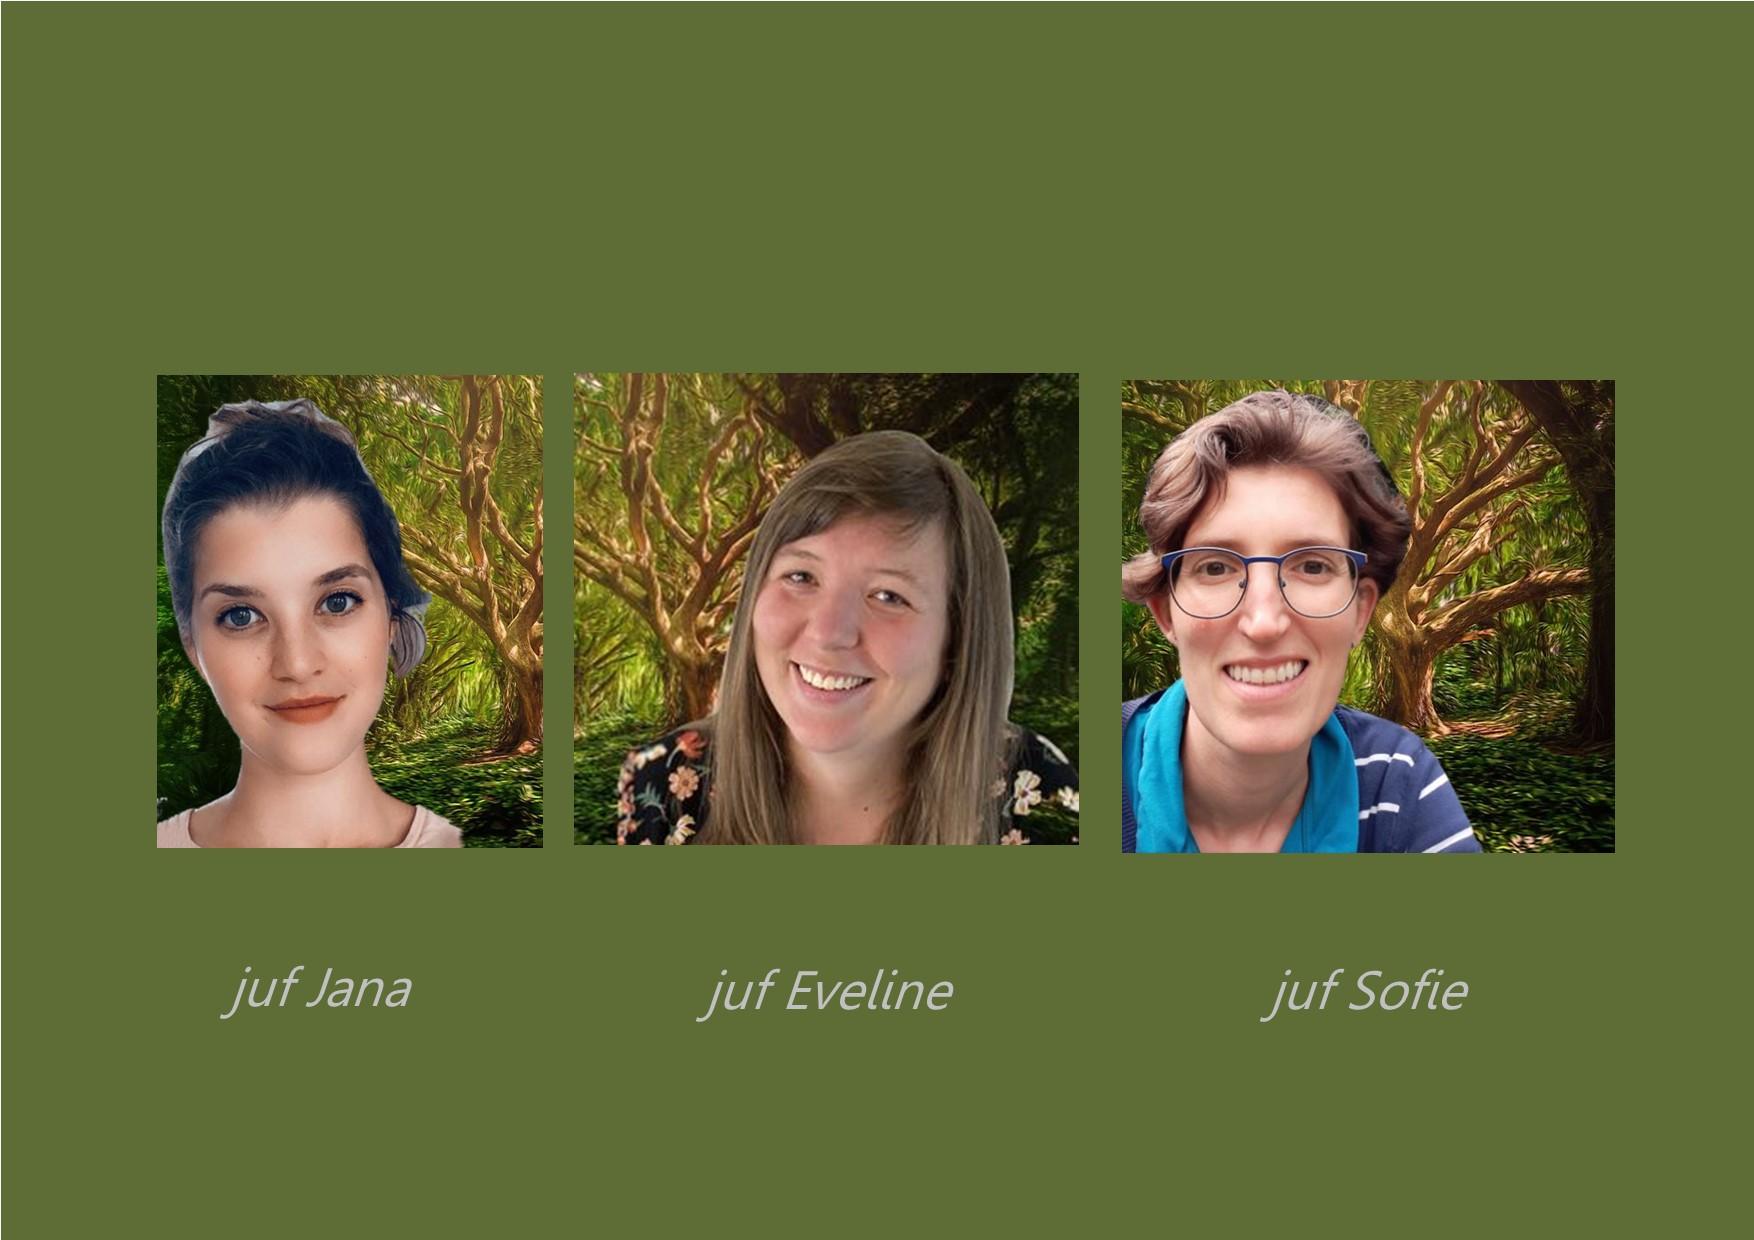 <p>2de leerjaar: juf Eveline (vanaf 1/10 juf Fleur) en juf Jana<br />co-teachers: juf Sofie en juf Isabella</p>